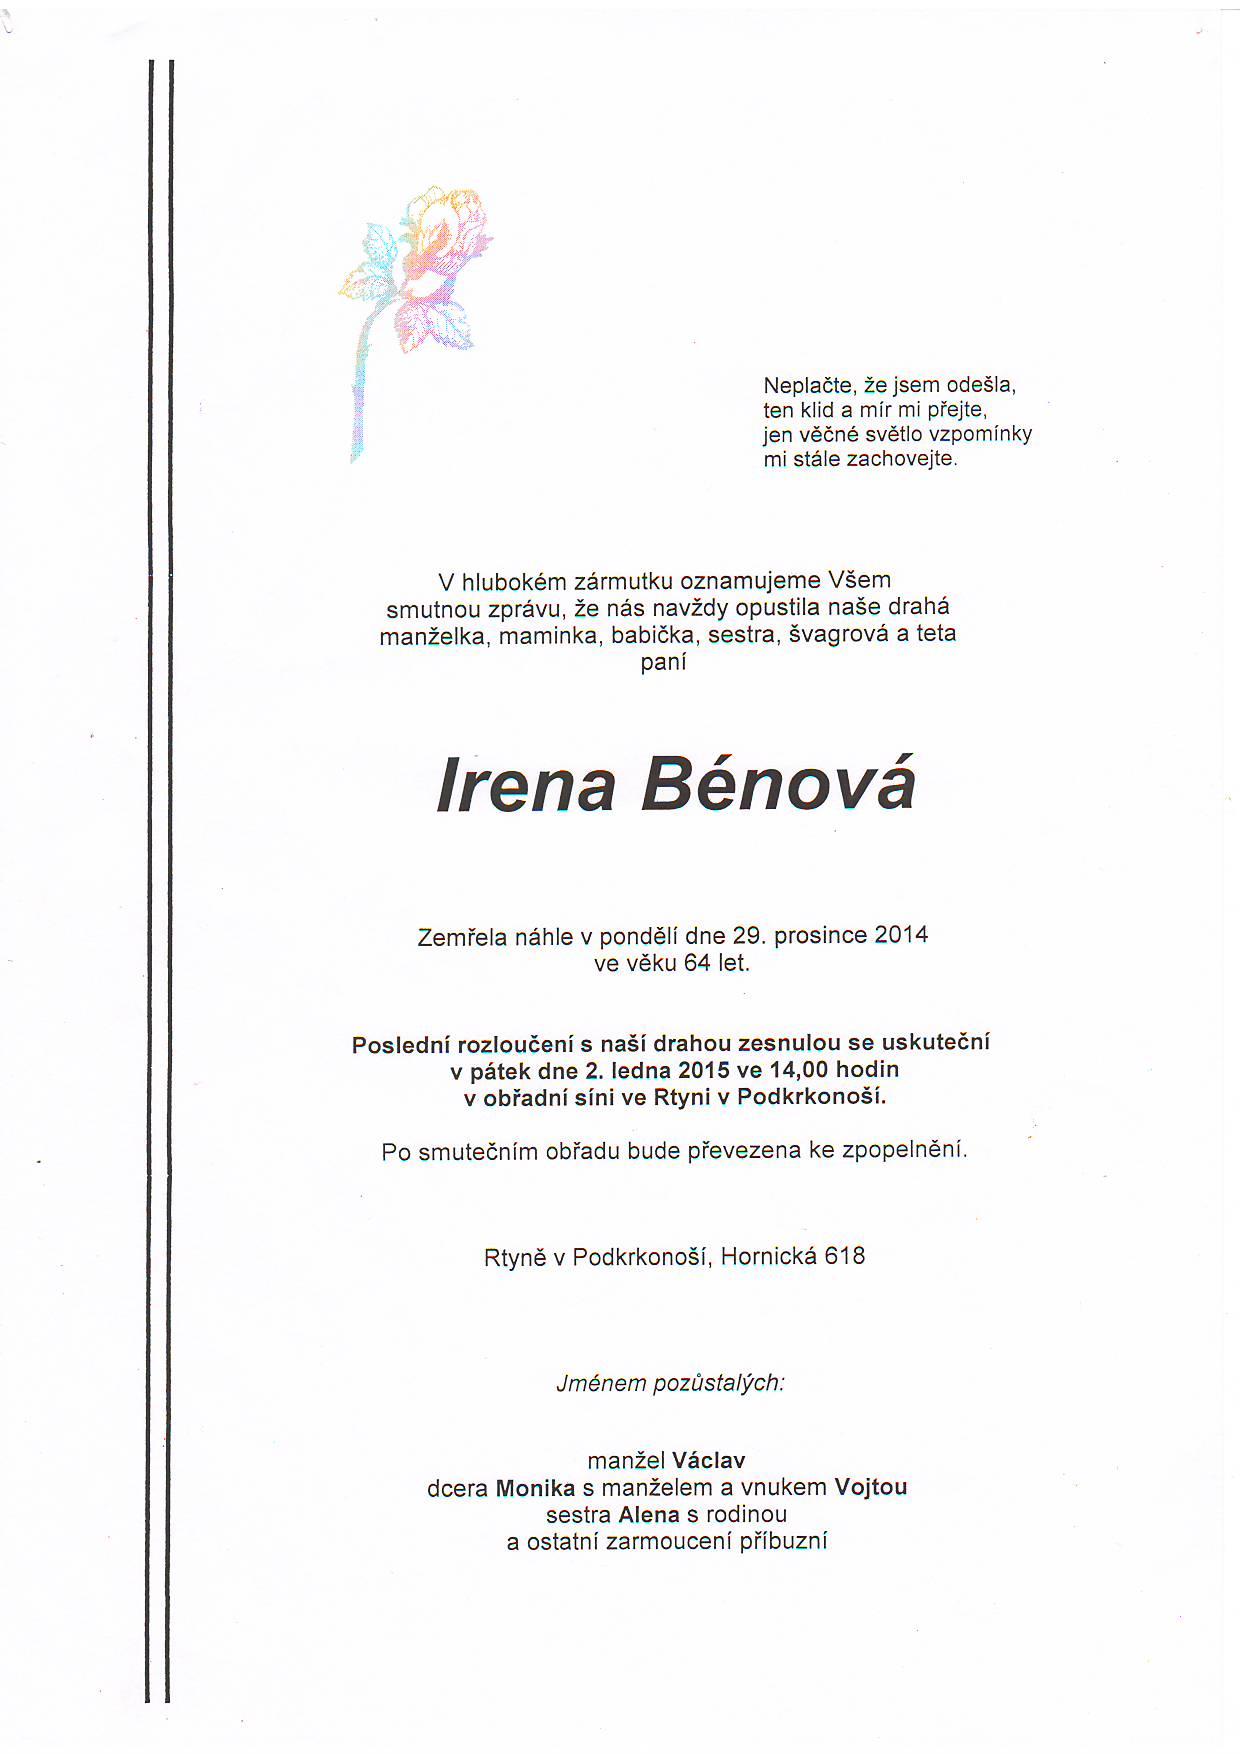 23_benova_irena